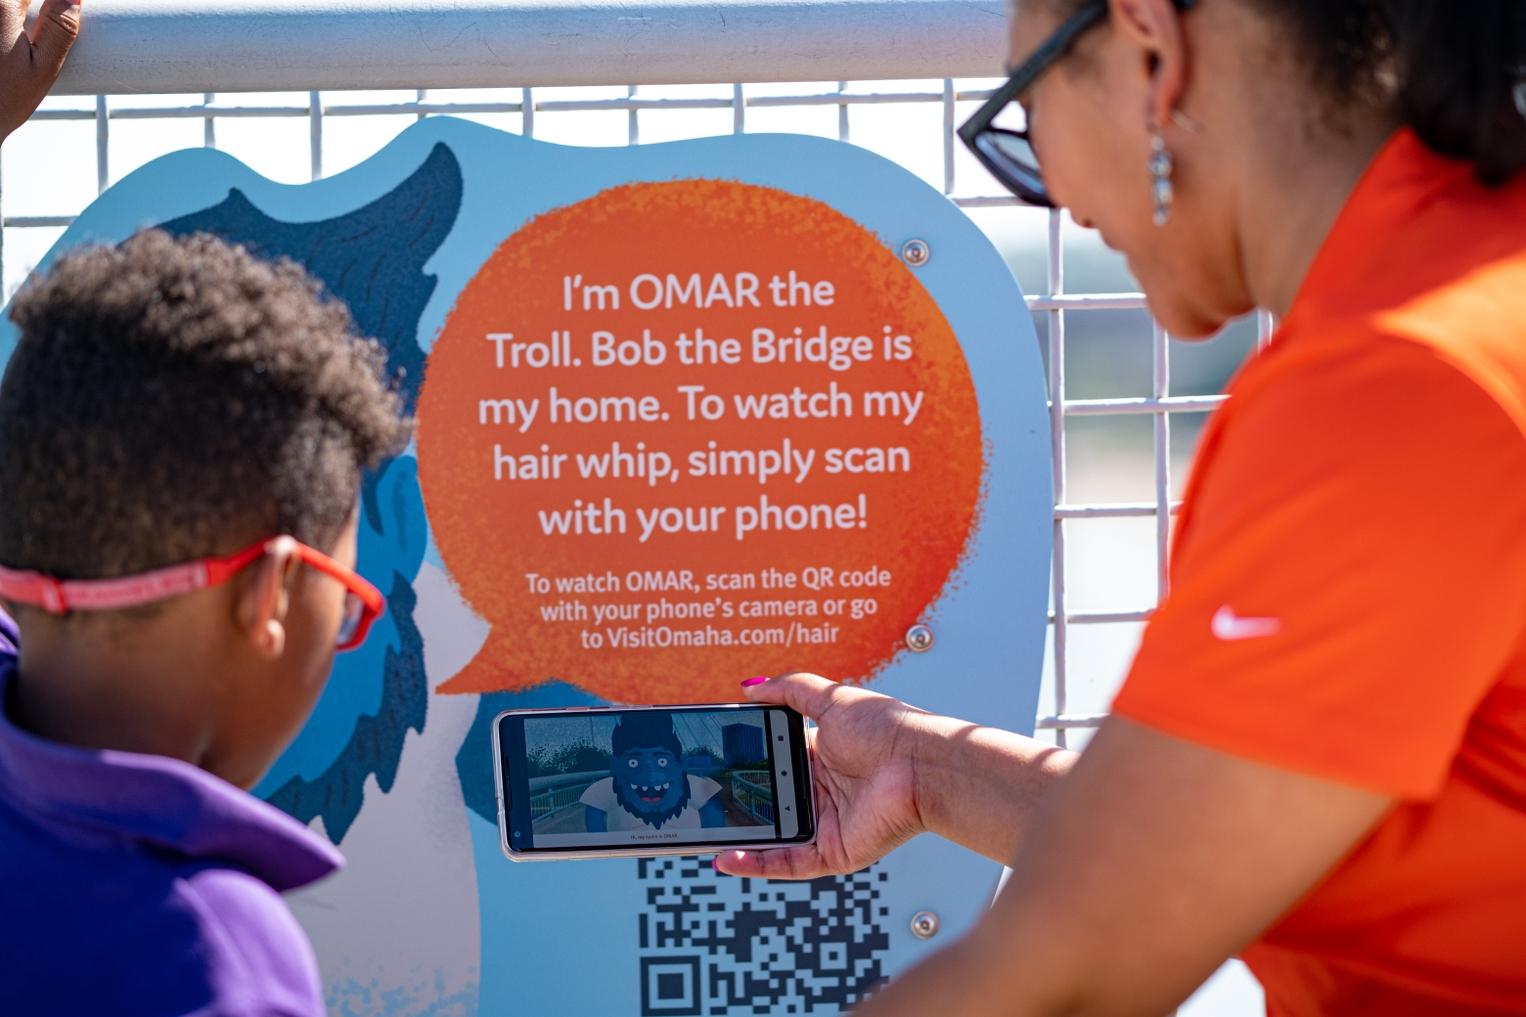 OMAR Bridge Sign 2